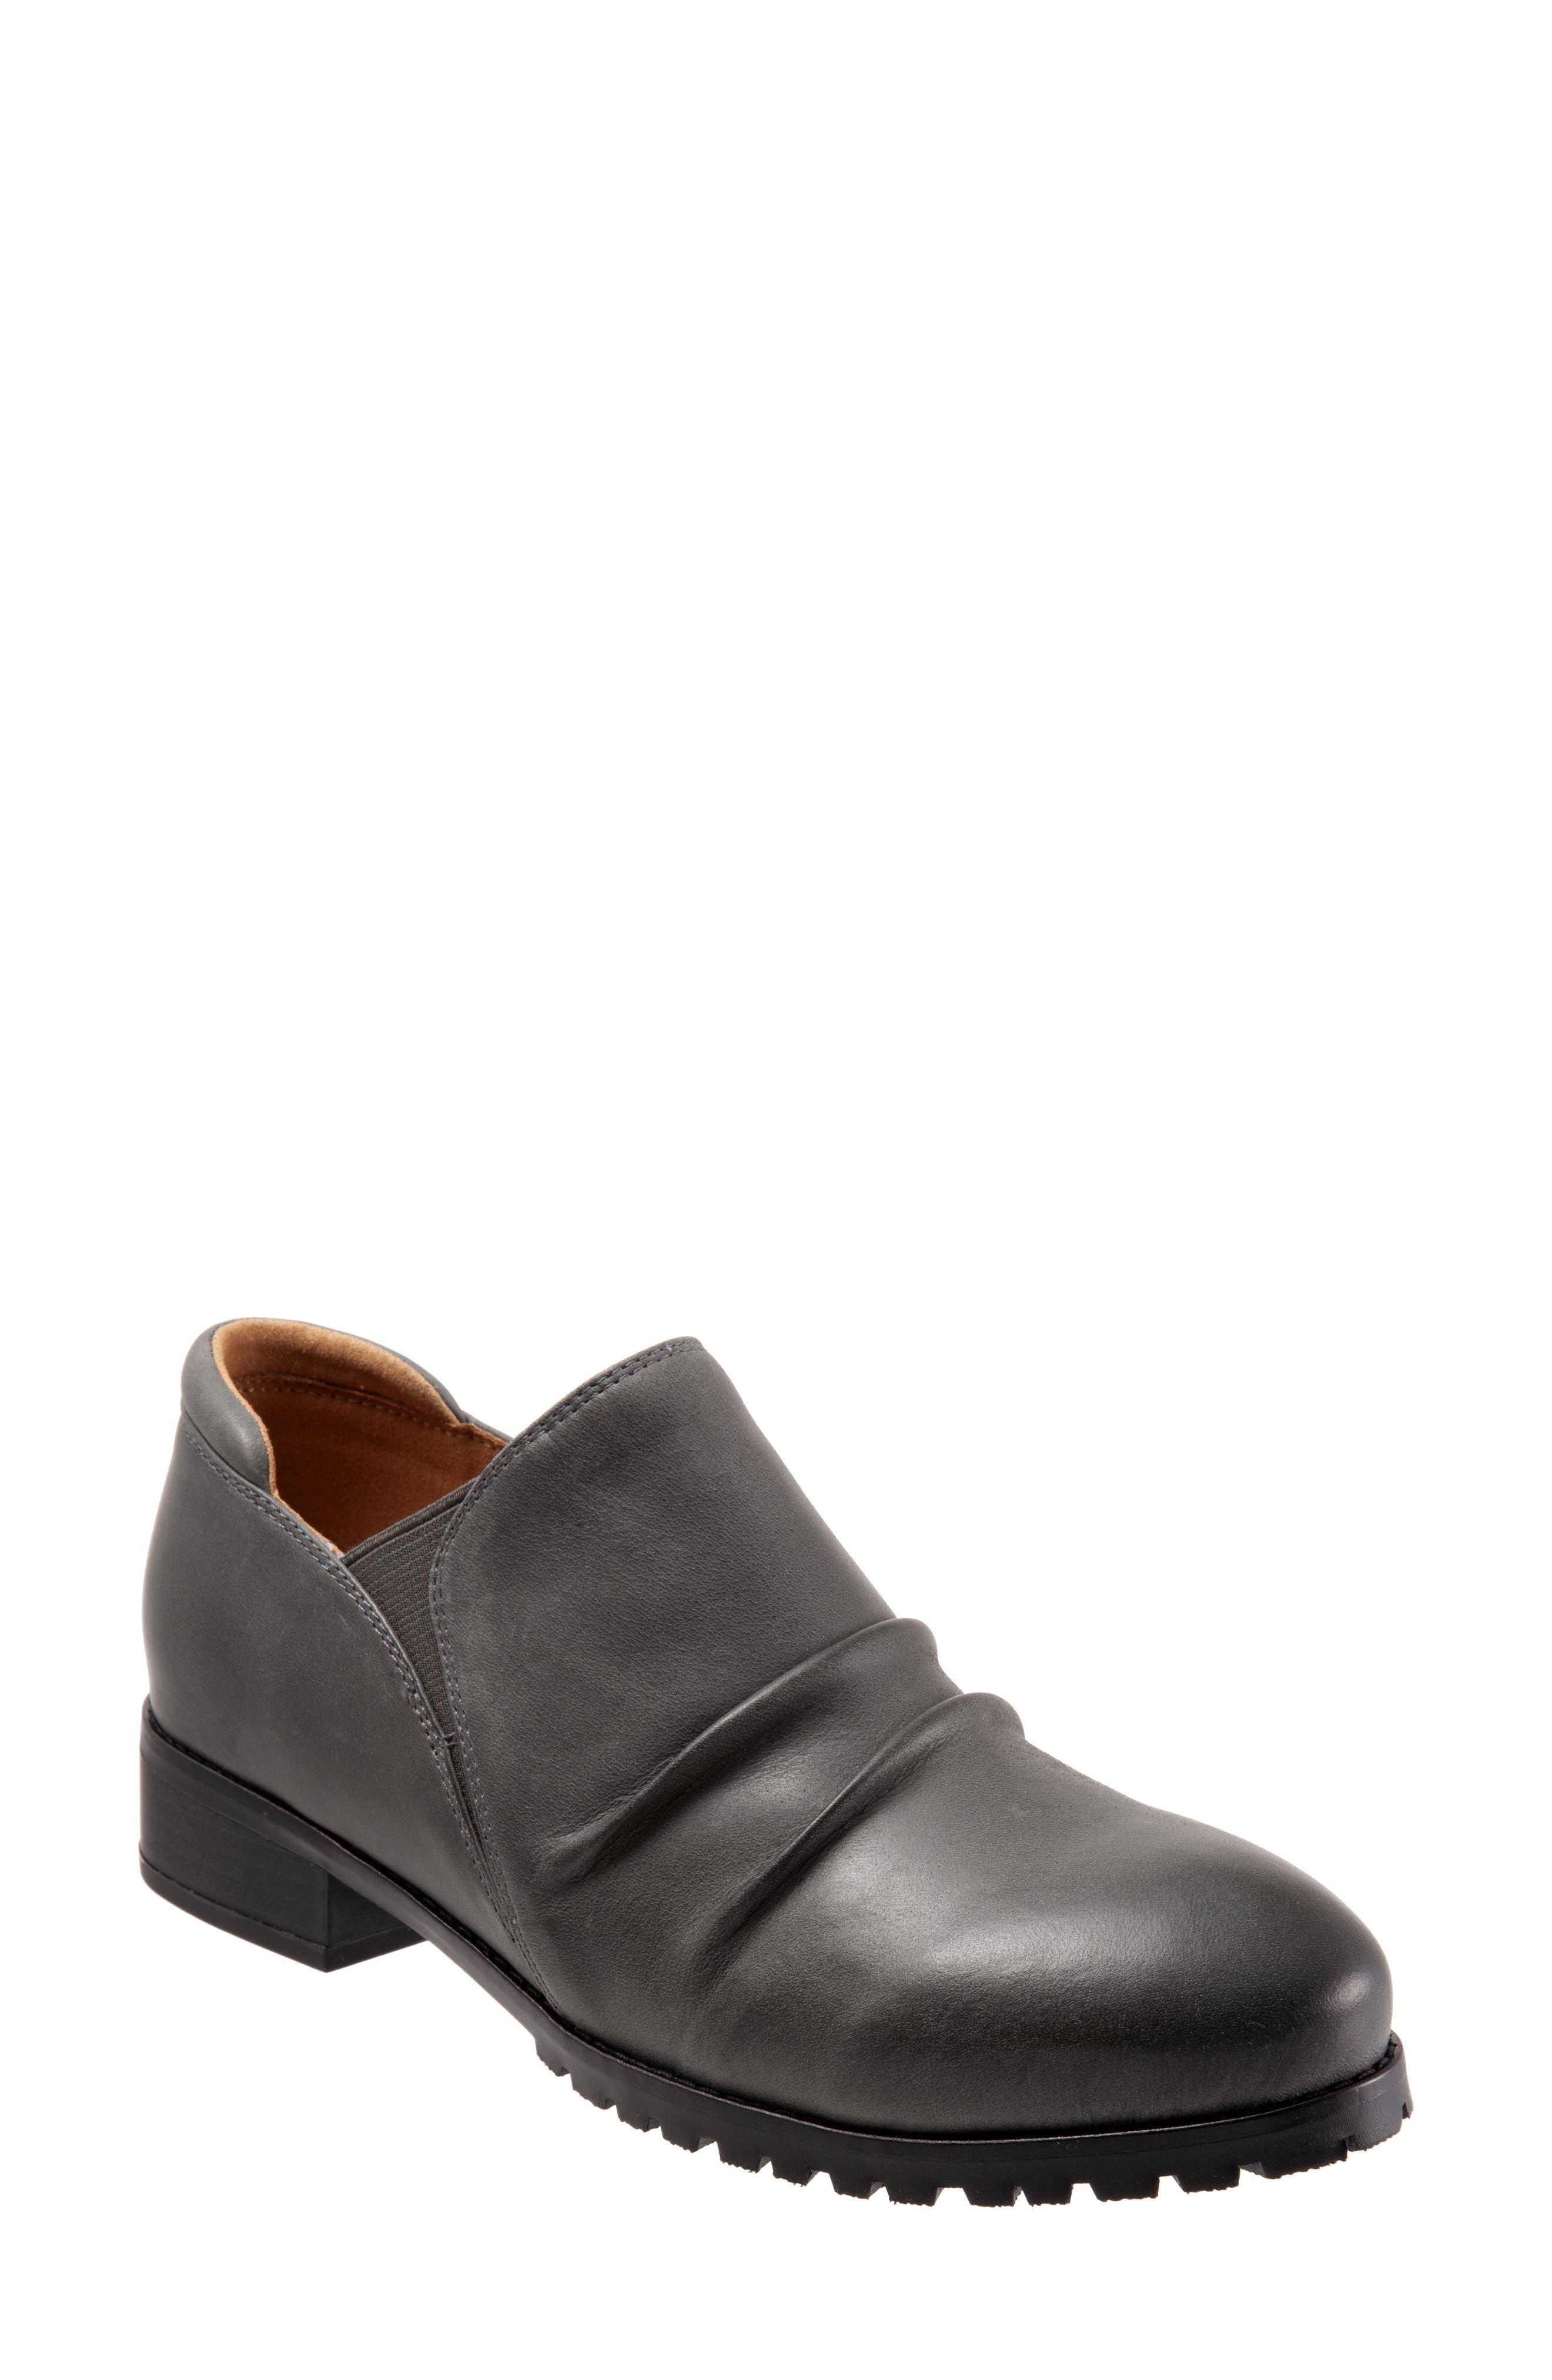 Softwalk Mara Ankle Boot W - Grey